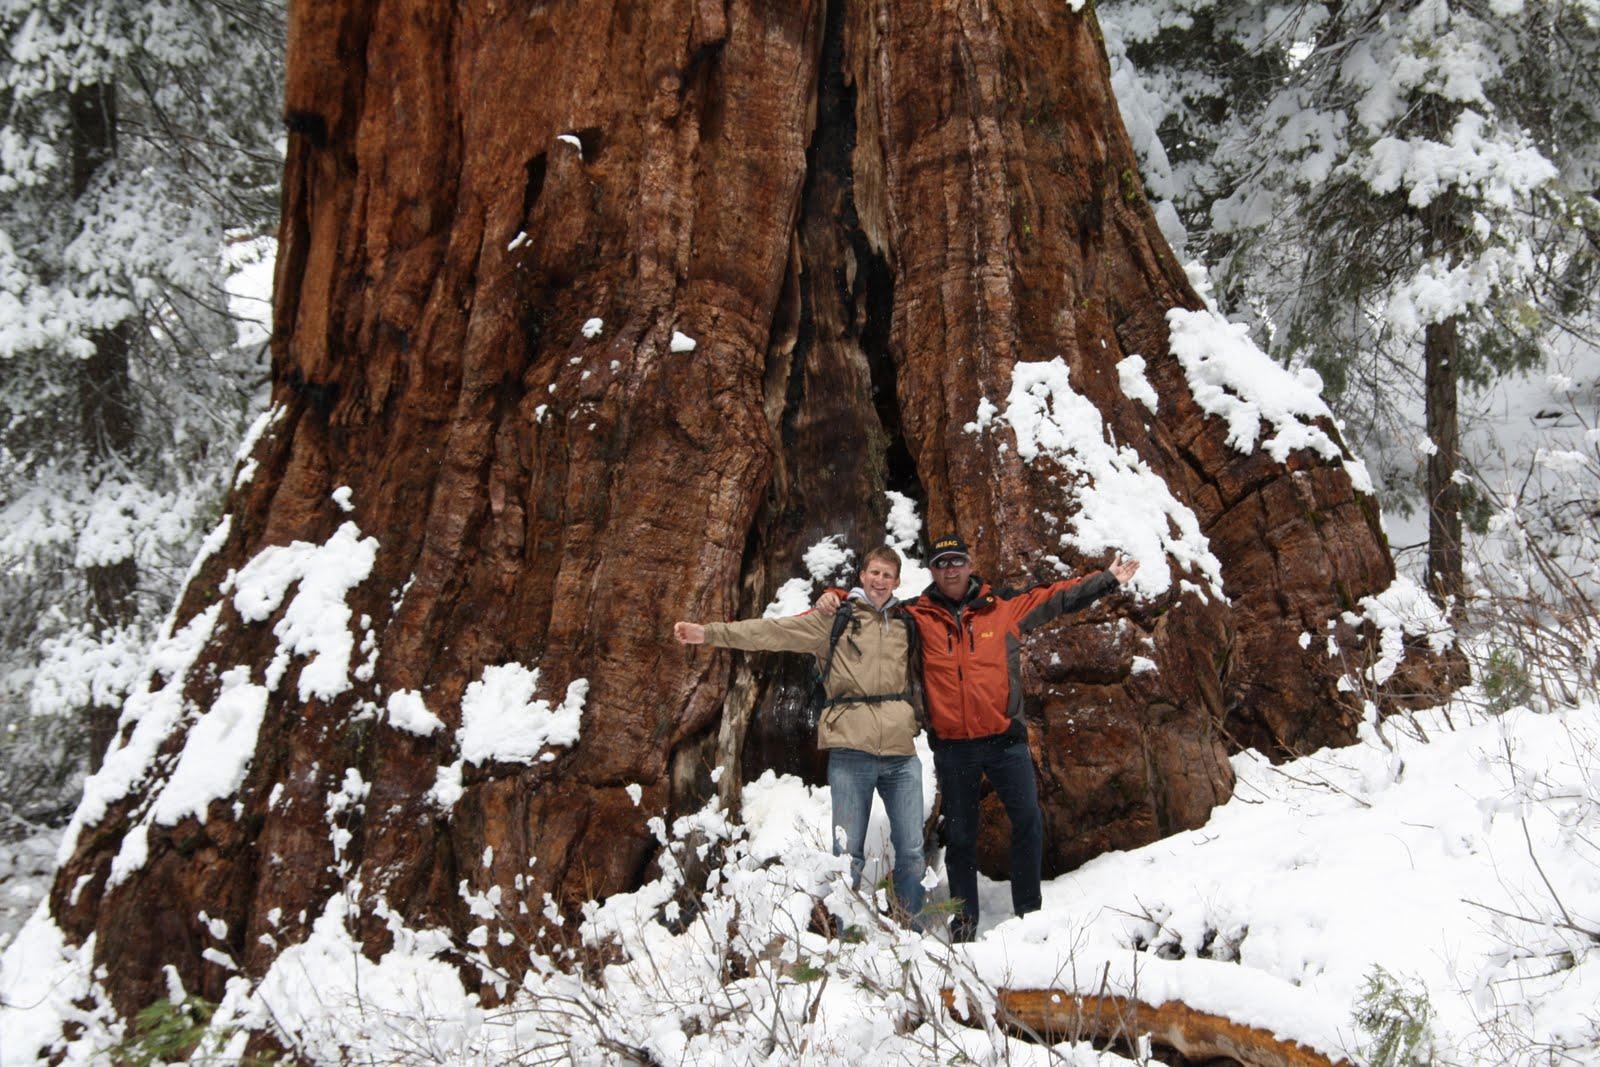 Familie Michl in Amerika Yosemite National Park